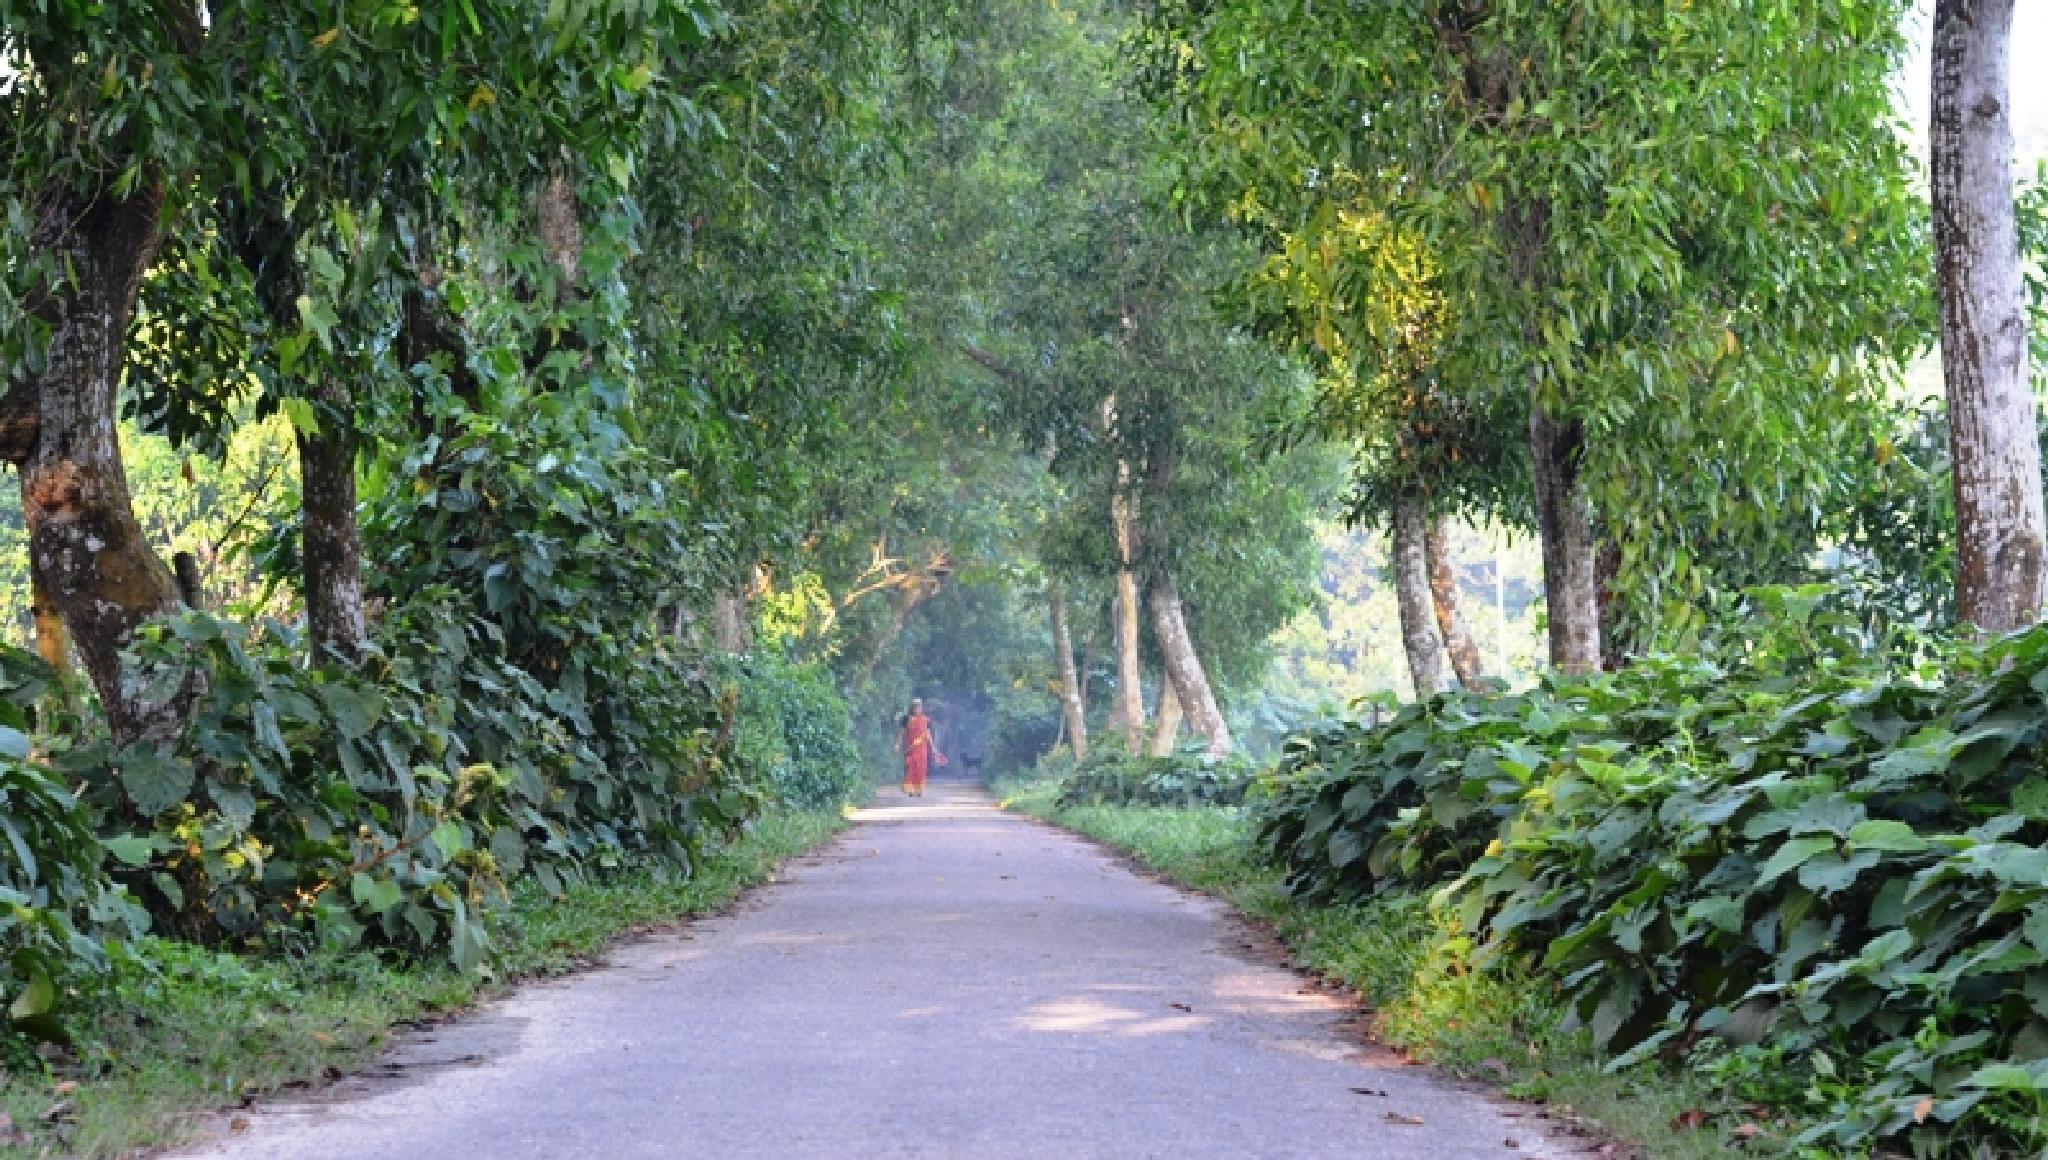 Woman vs Road  by apurahaman1